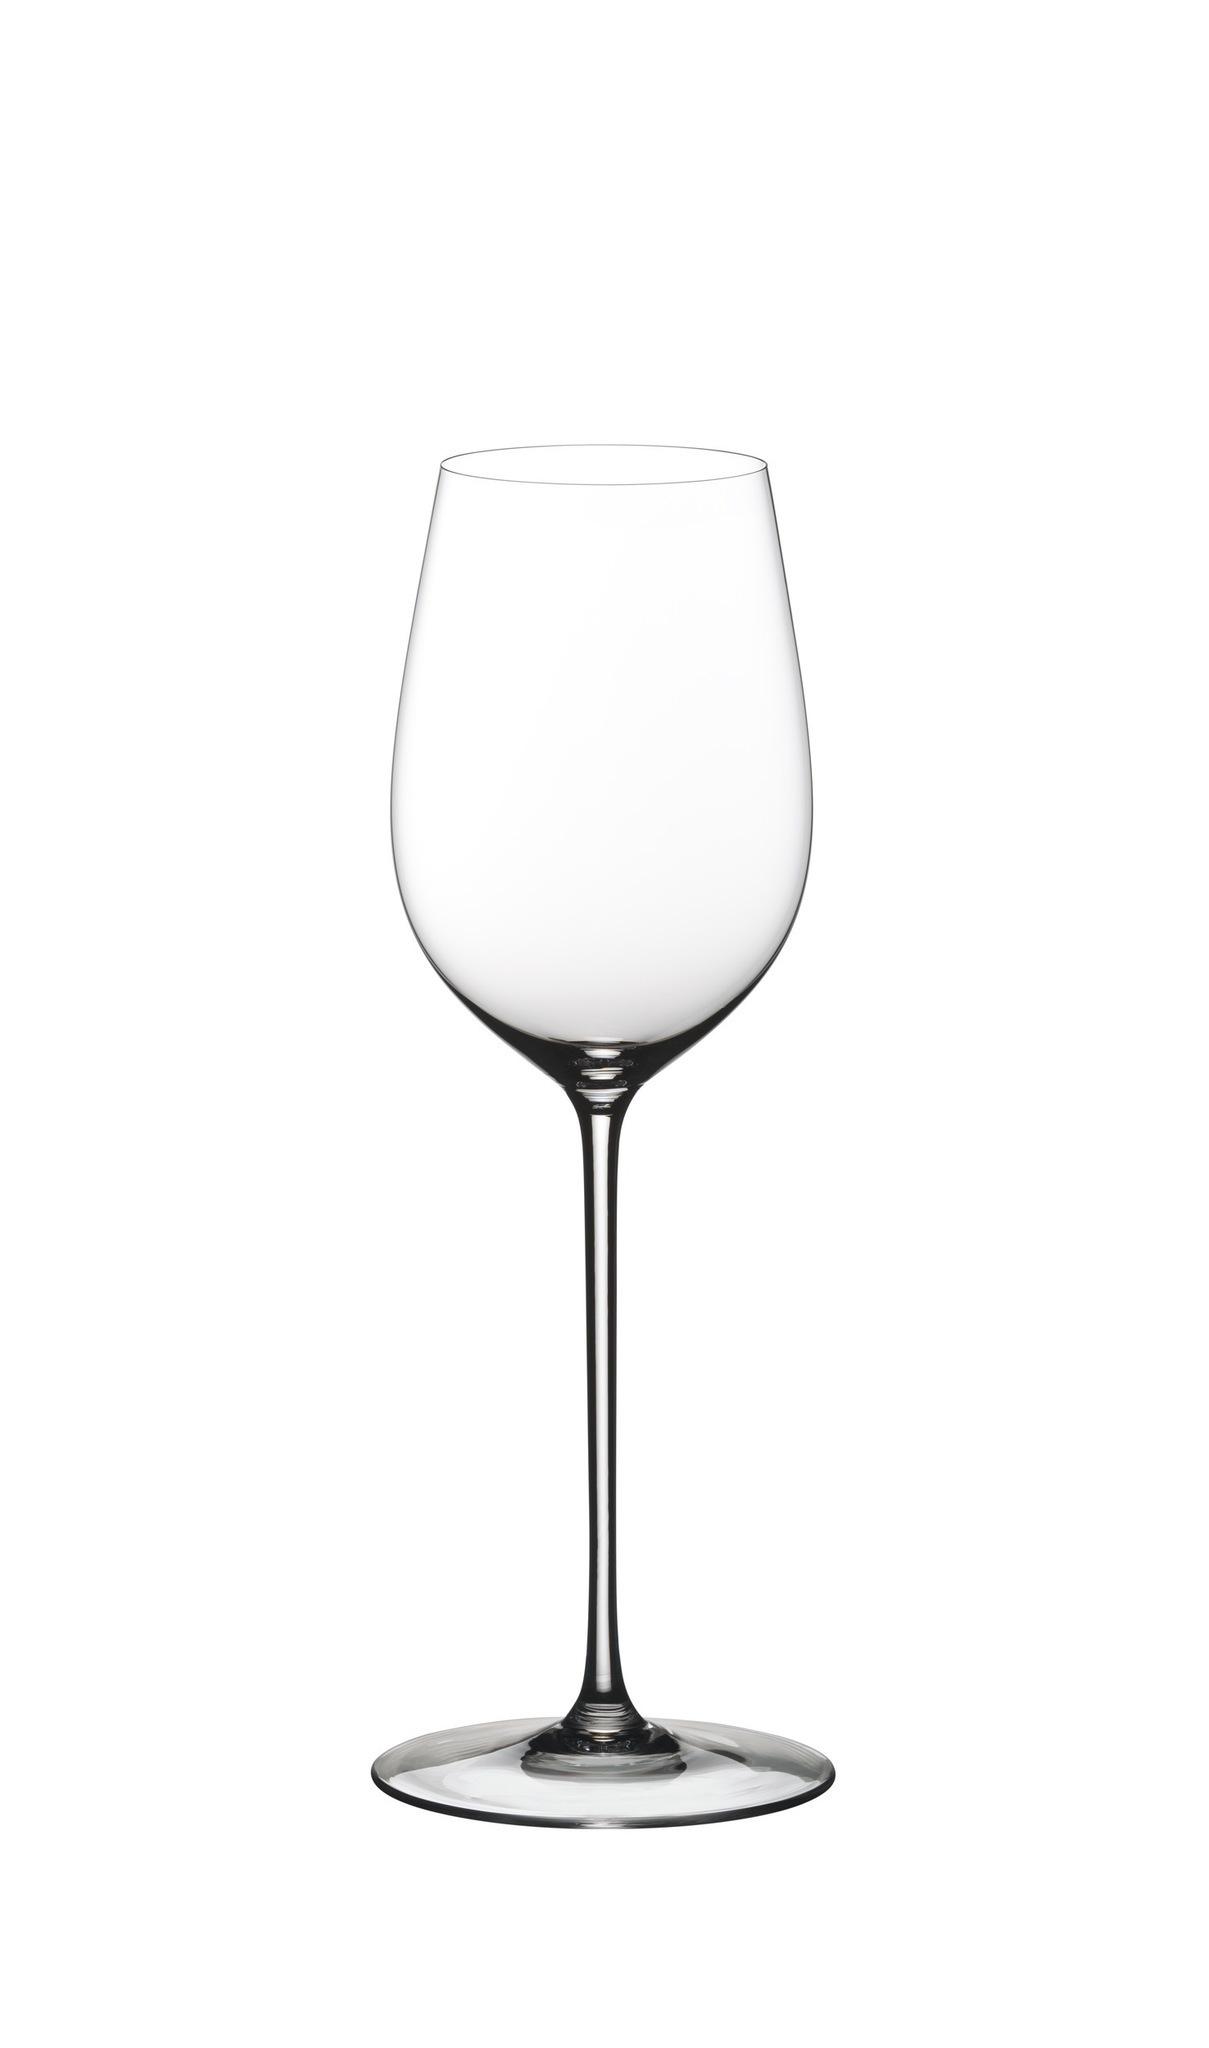 Бокал для вина Riedel Viognier/Chardonnay, Riedel Superleggero, 475 мл